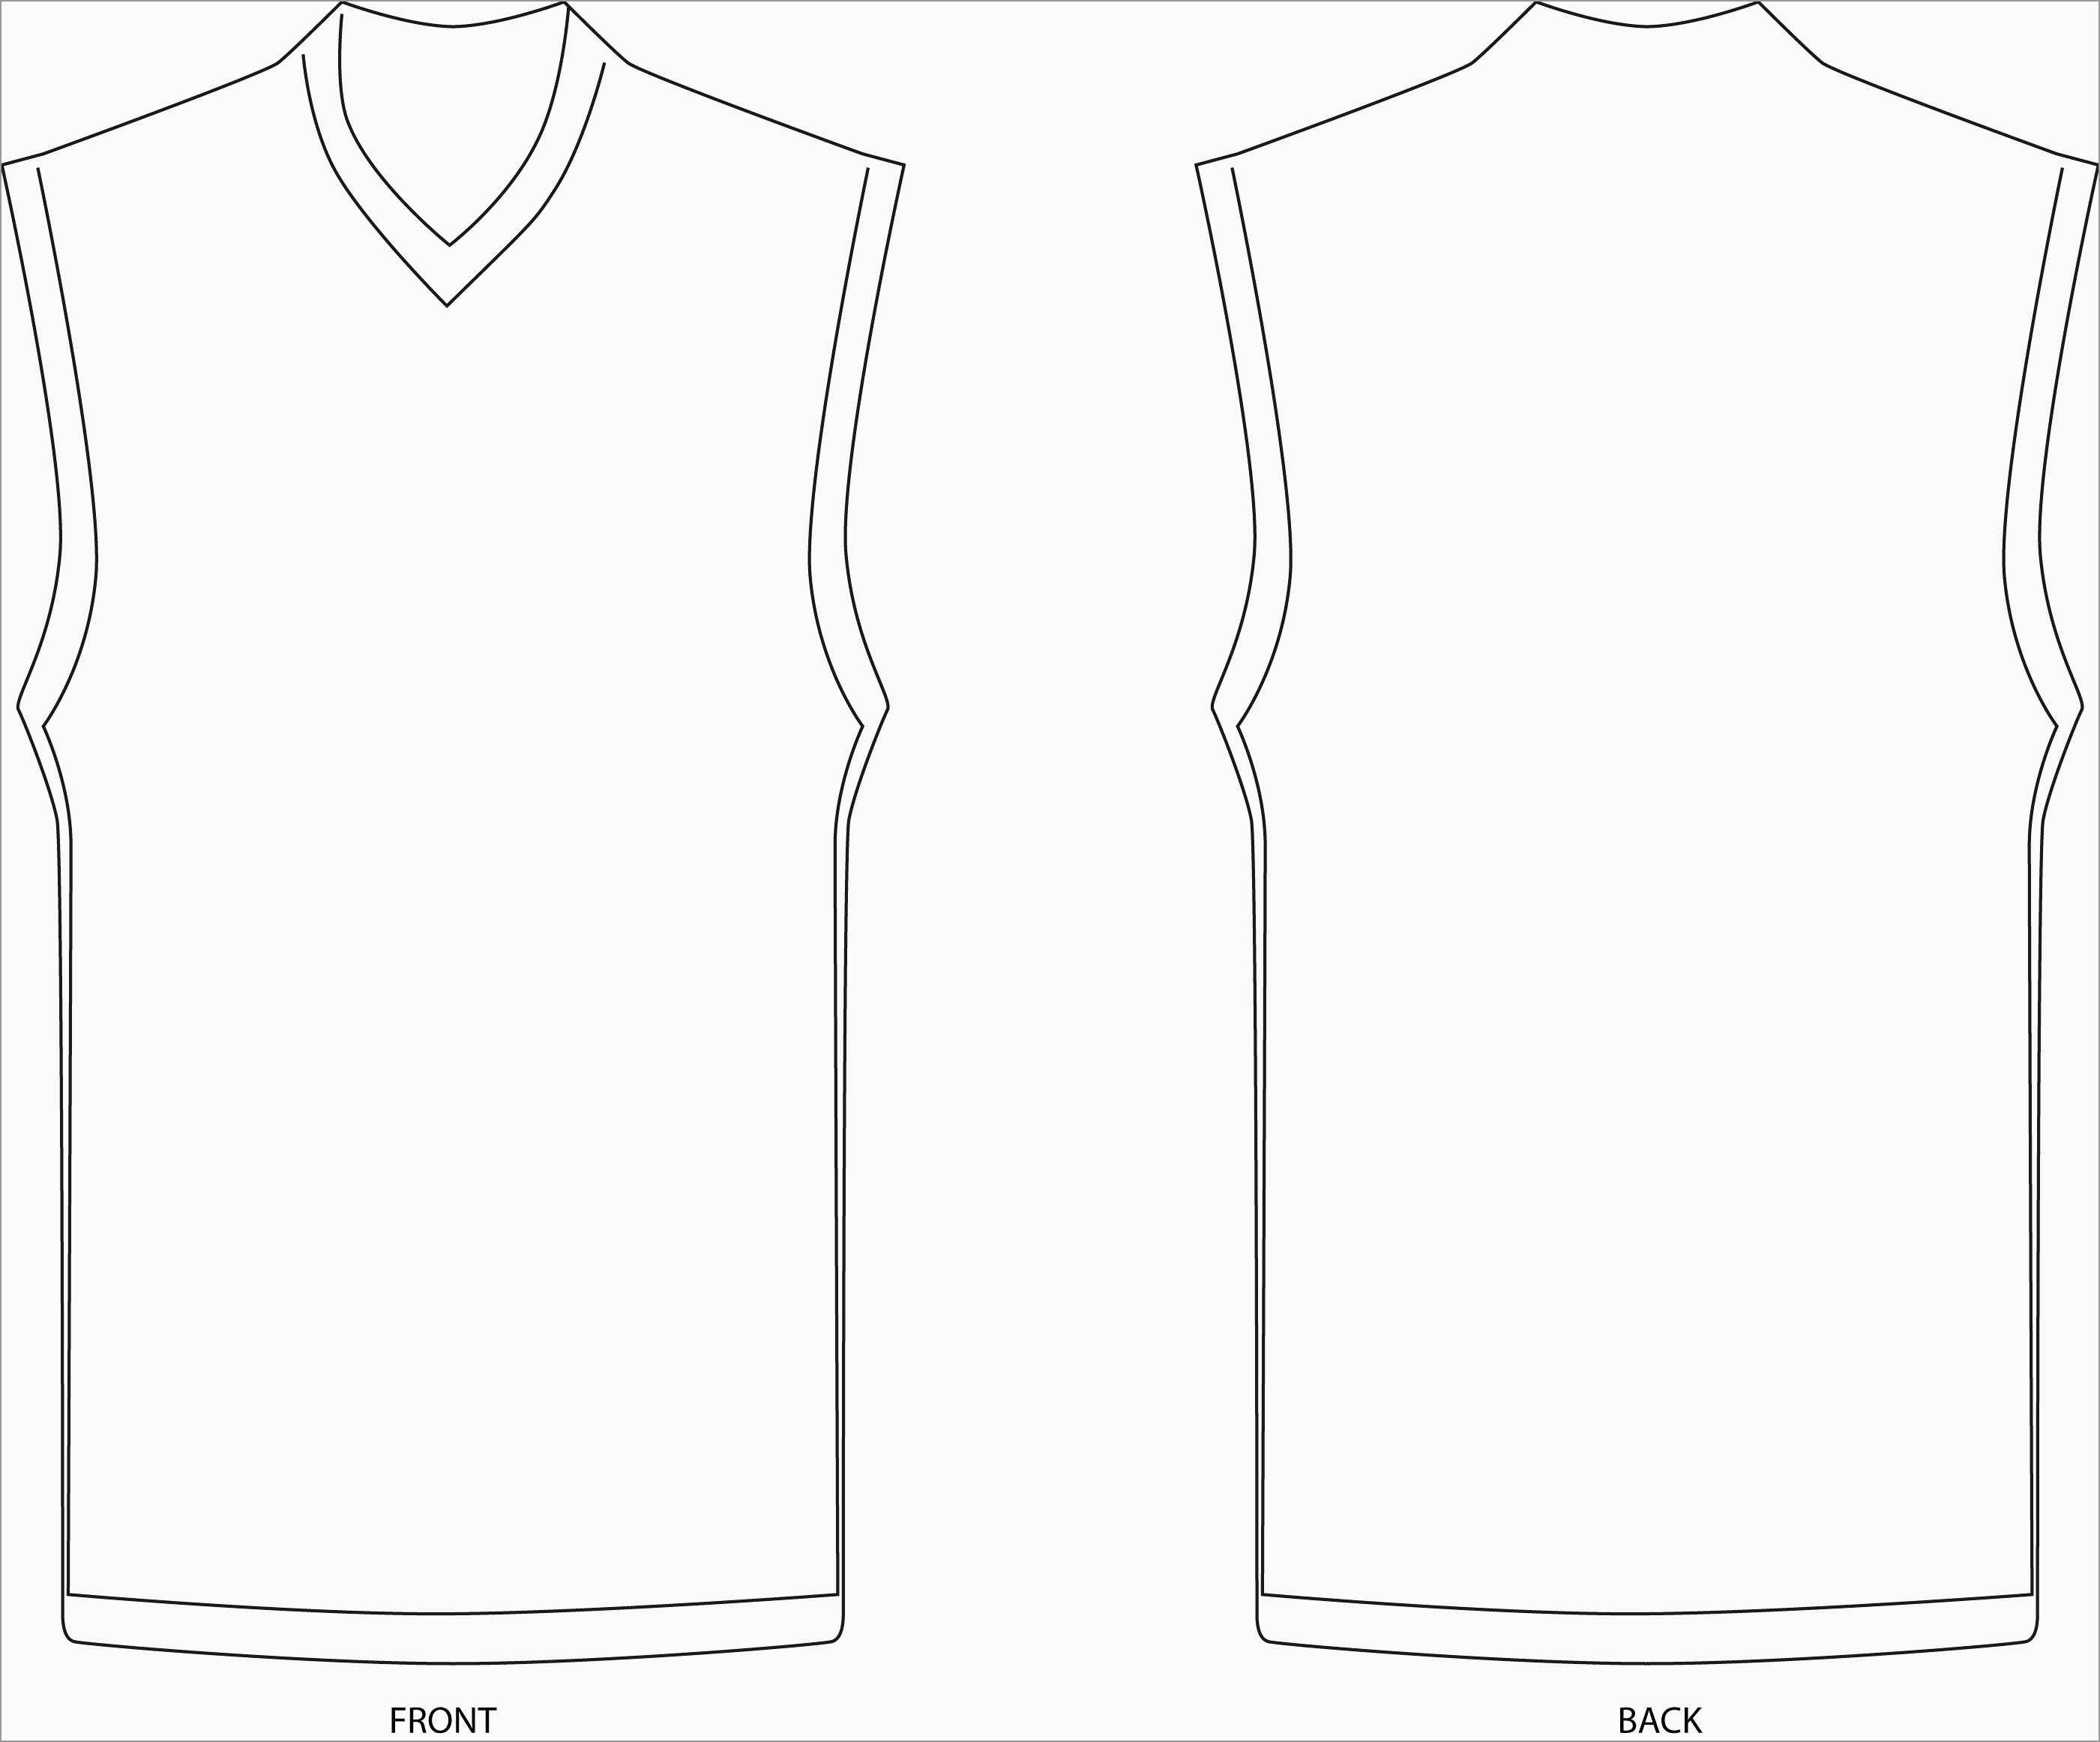 Inspirational Baseball Jersey Vector Template Free  Best Of Template In Blank Basketball Uniform Template